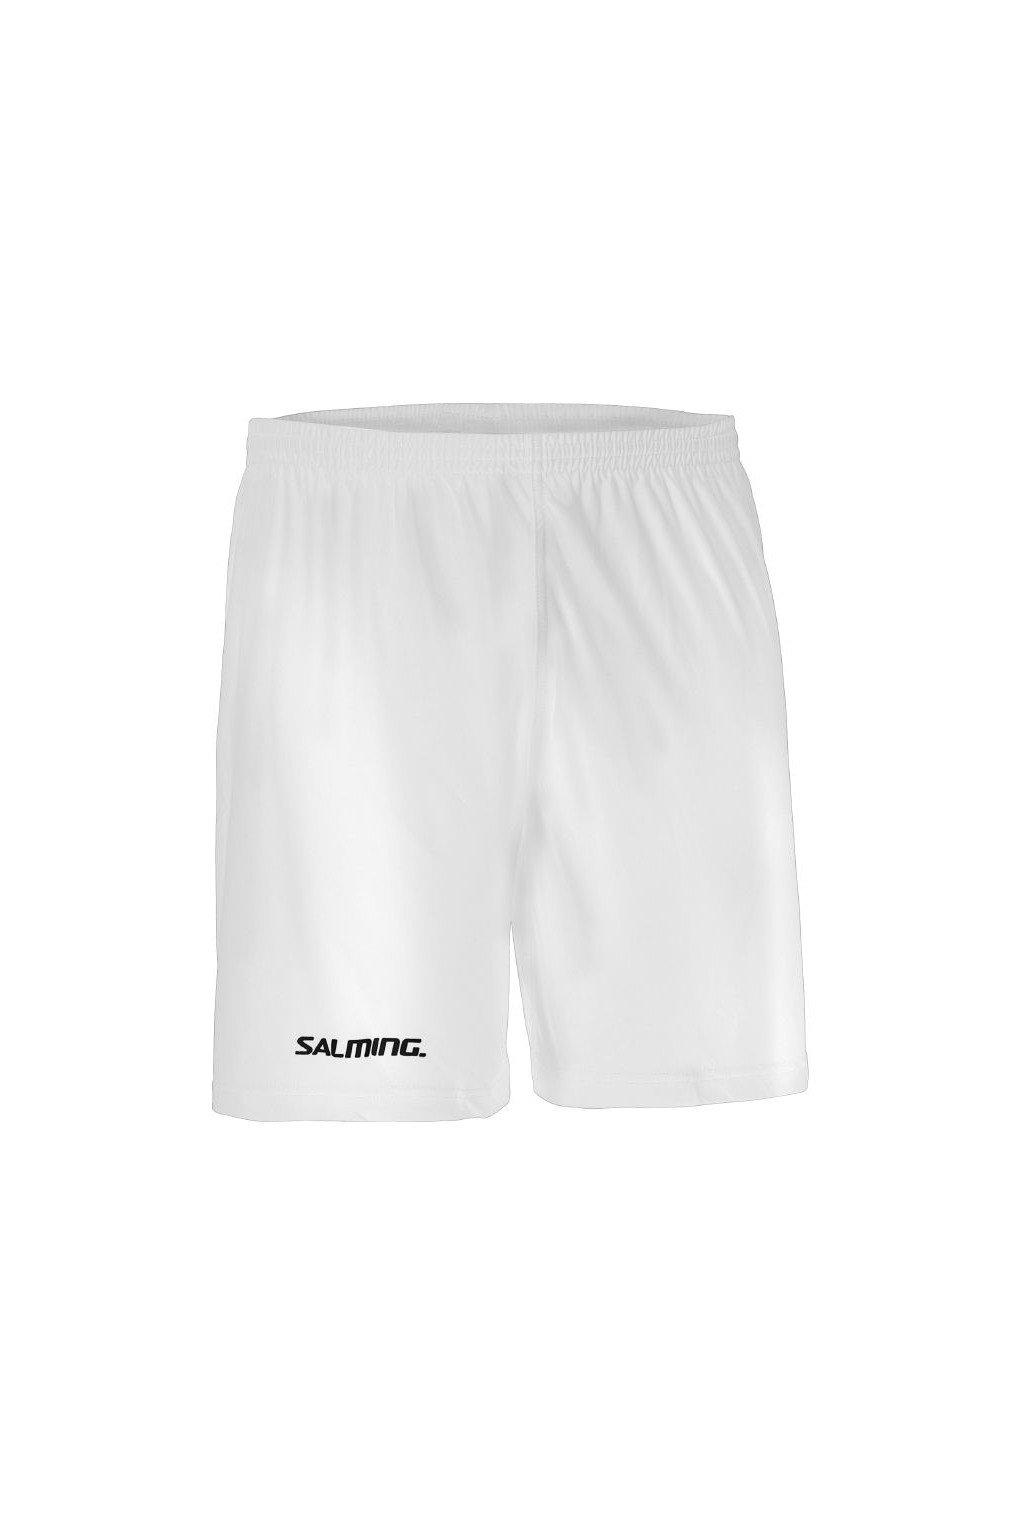 SALMING Core Shorts JR White